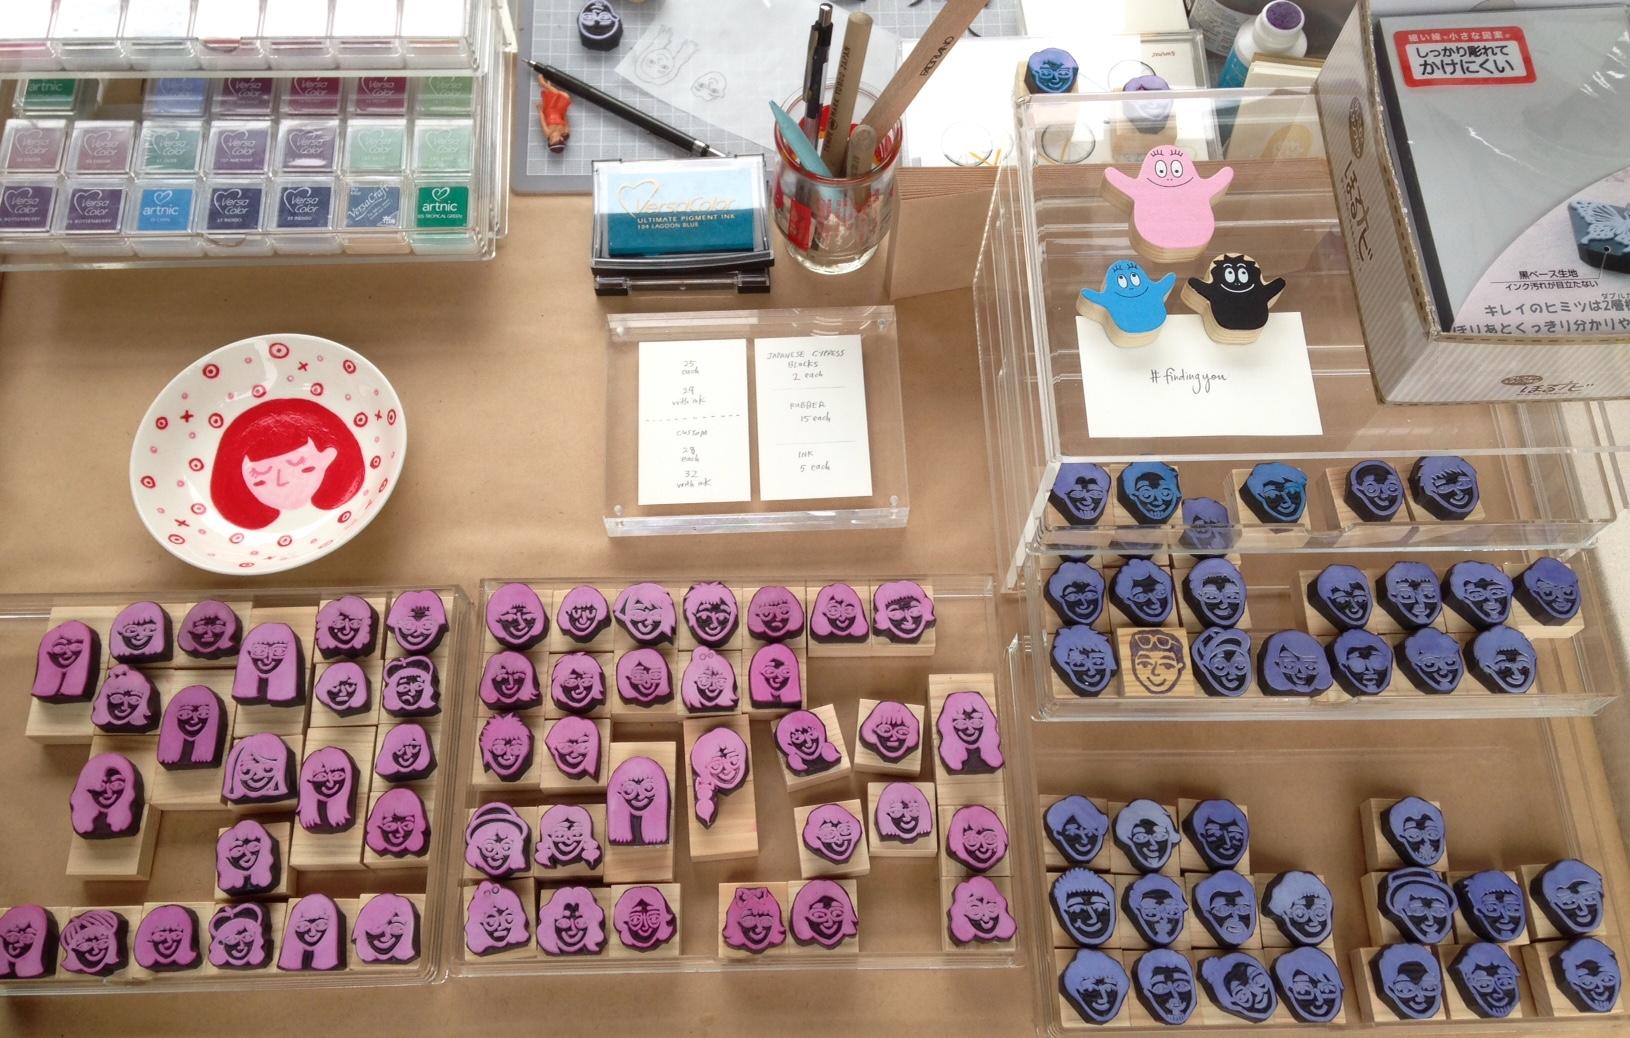 Handcrafted portrait stamps for sale at the Gillman Barracks Supermama Design Mart in April 2017.